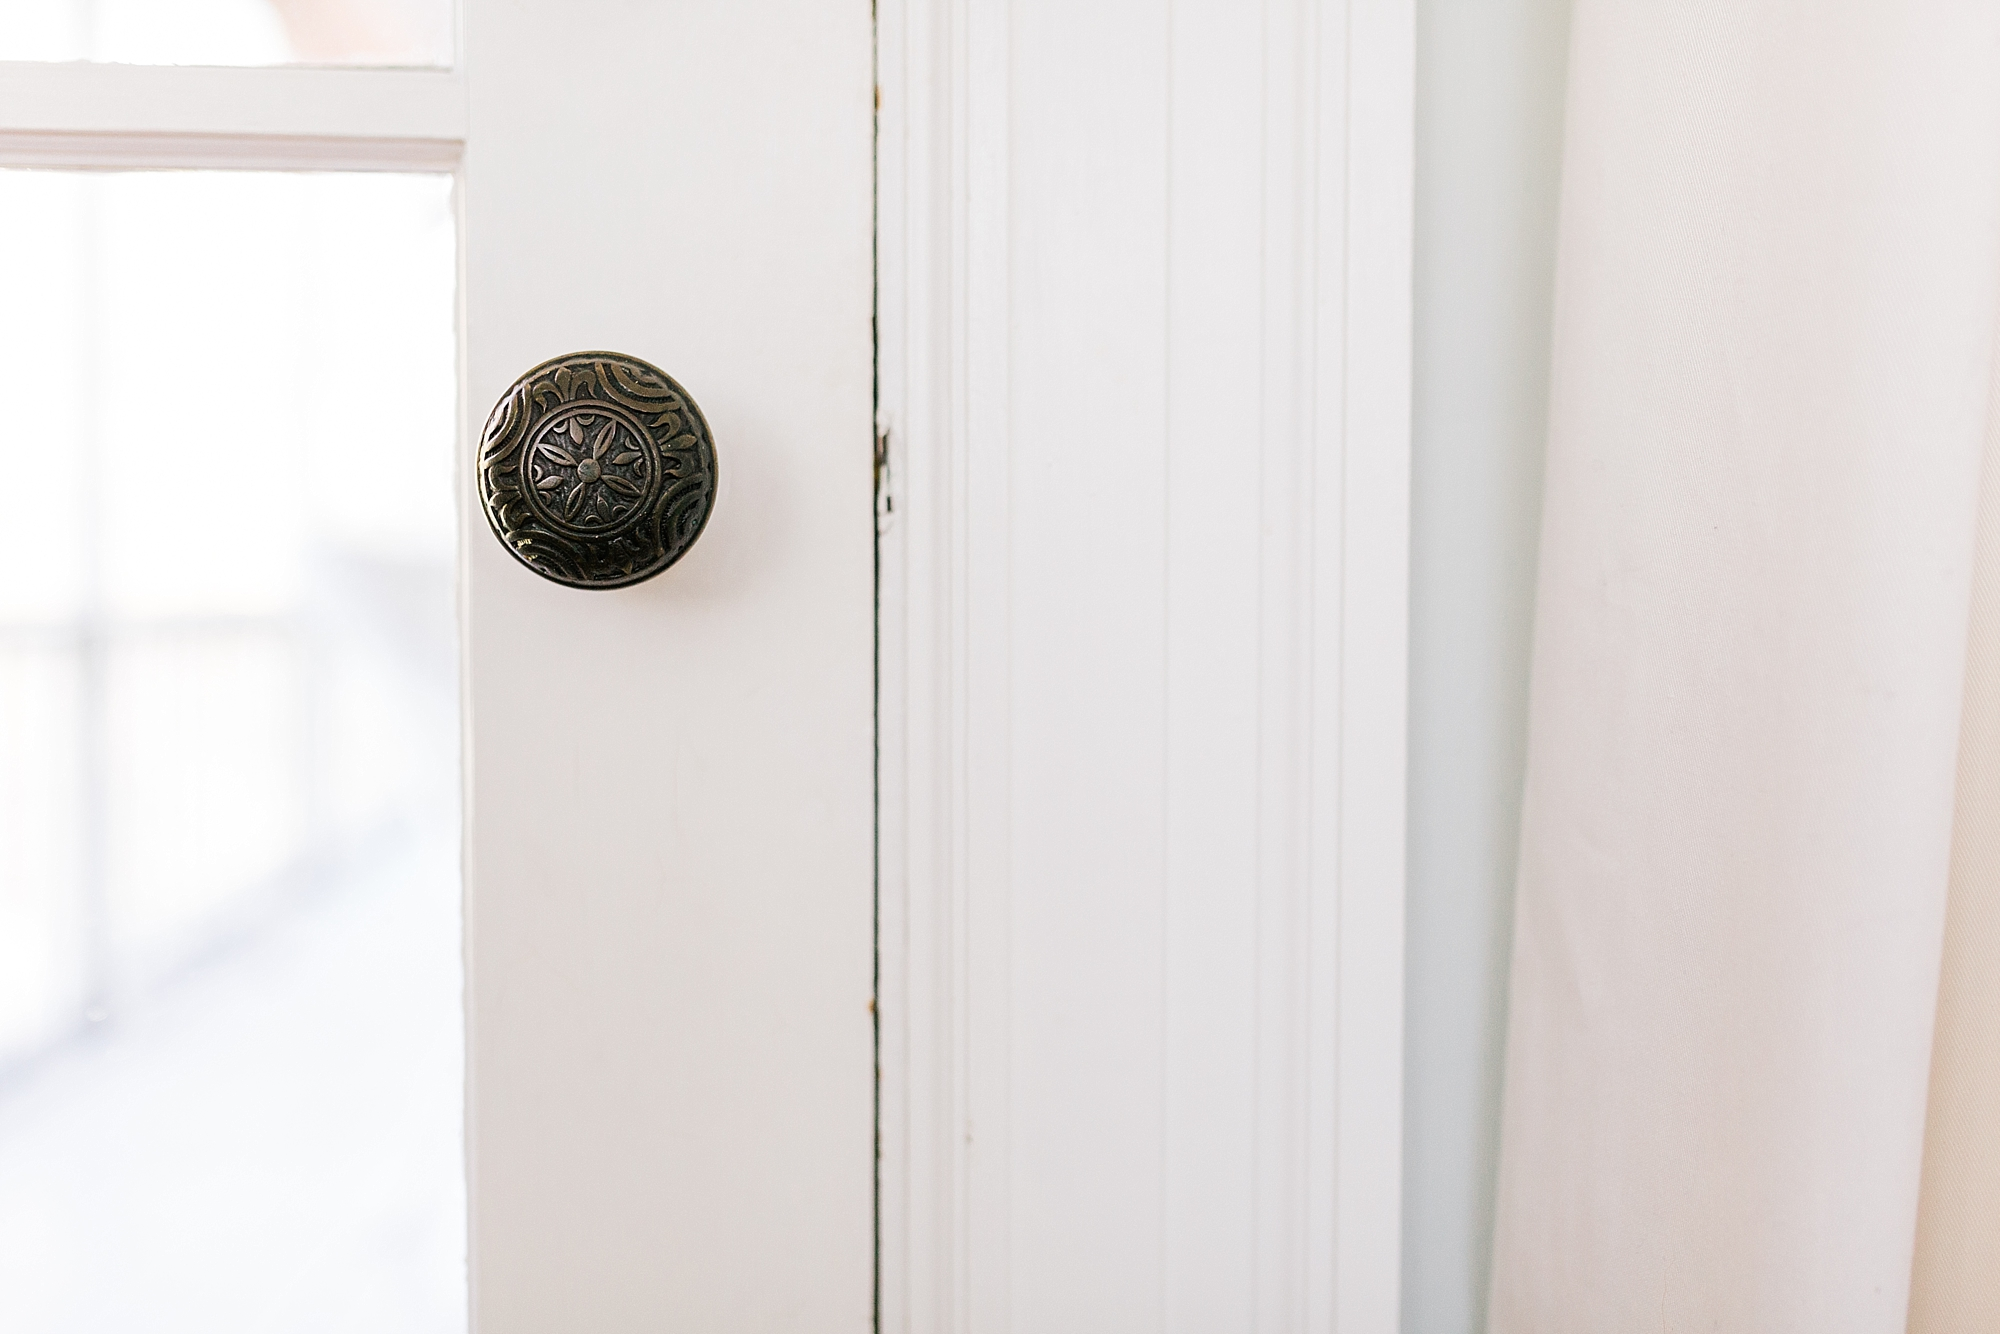 Vintage Door Knob - New Hampshire Home - Madison Rae Photography